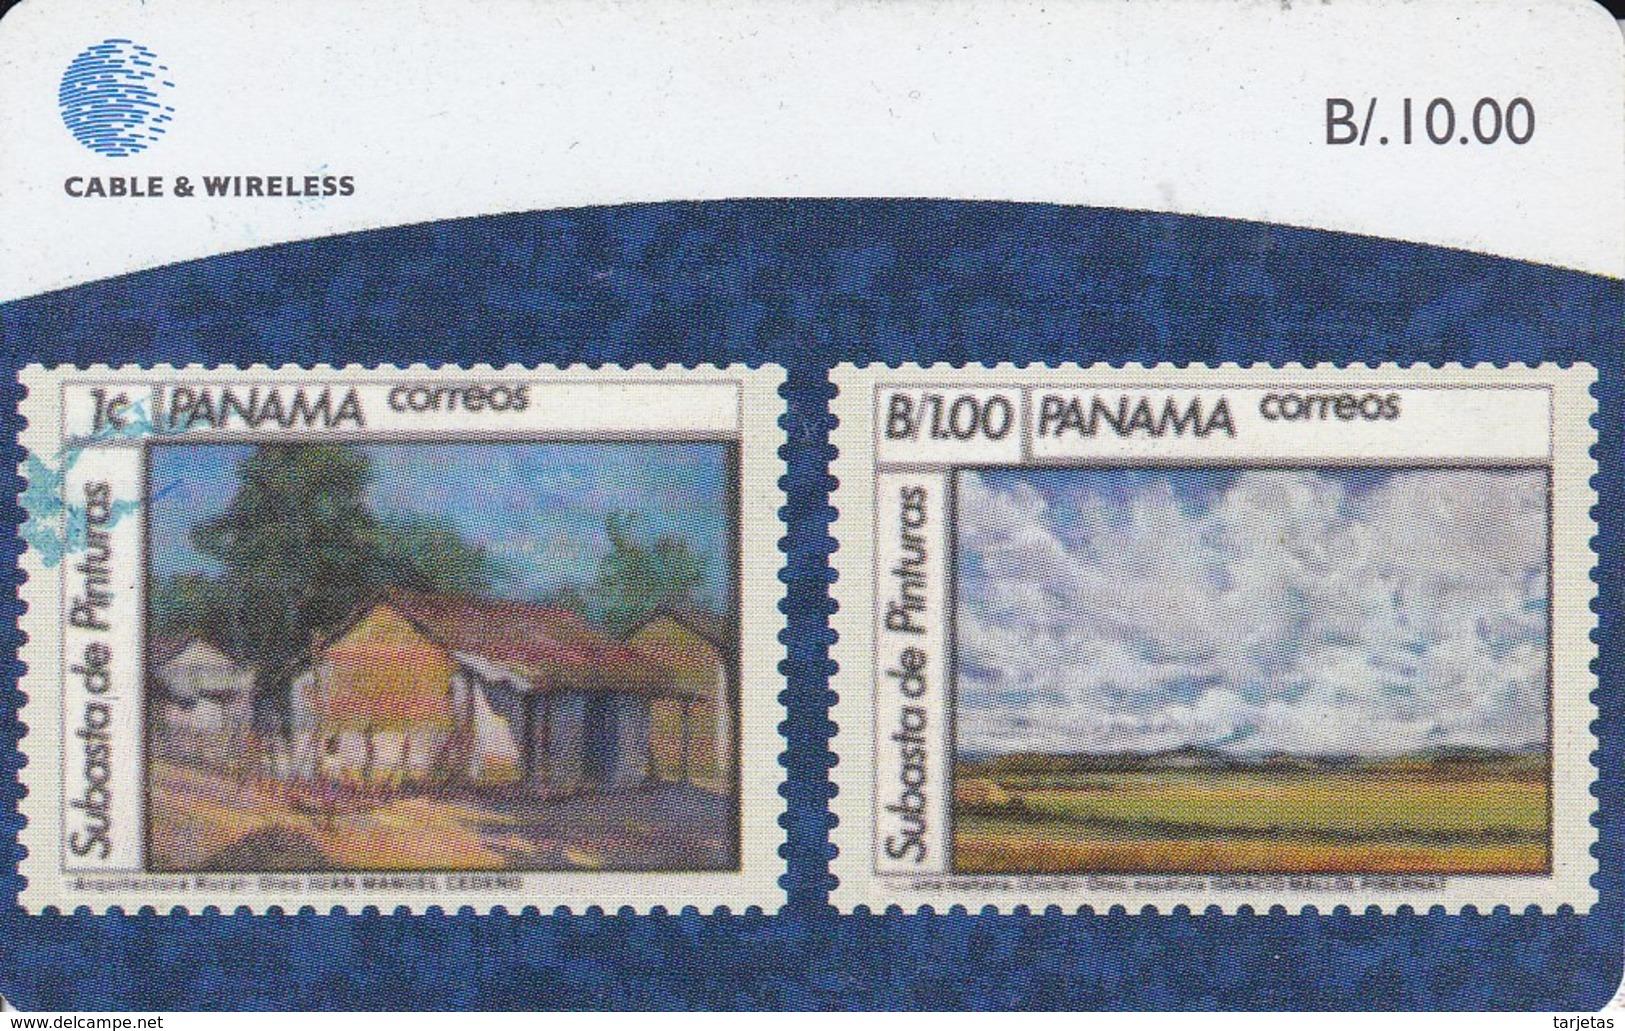 TARJETA DE PANAMA DE CABLE & WIRELESS DE B/10.00 (SELLO-STAMP) - Panamá